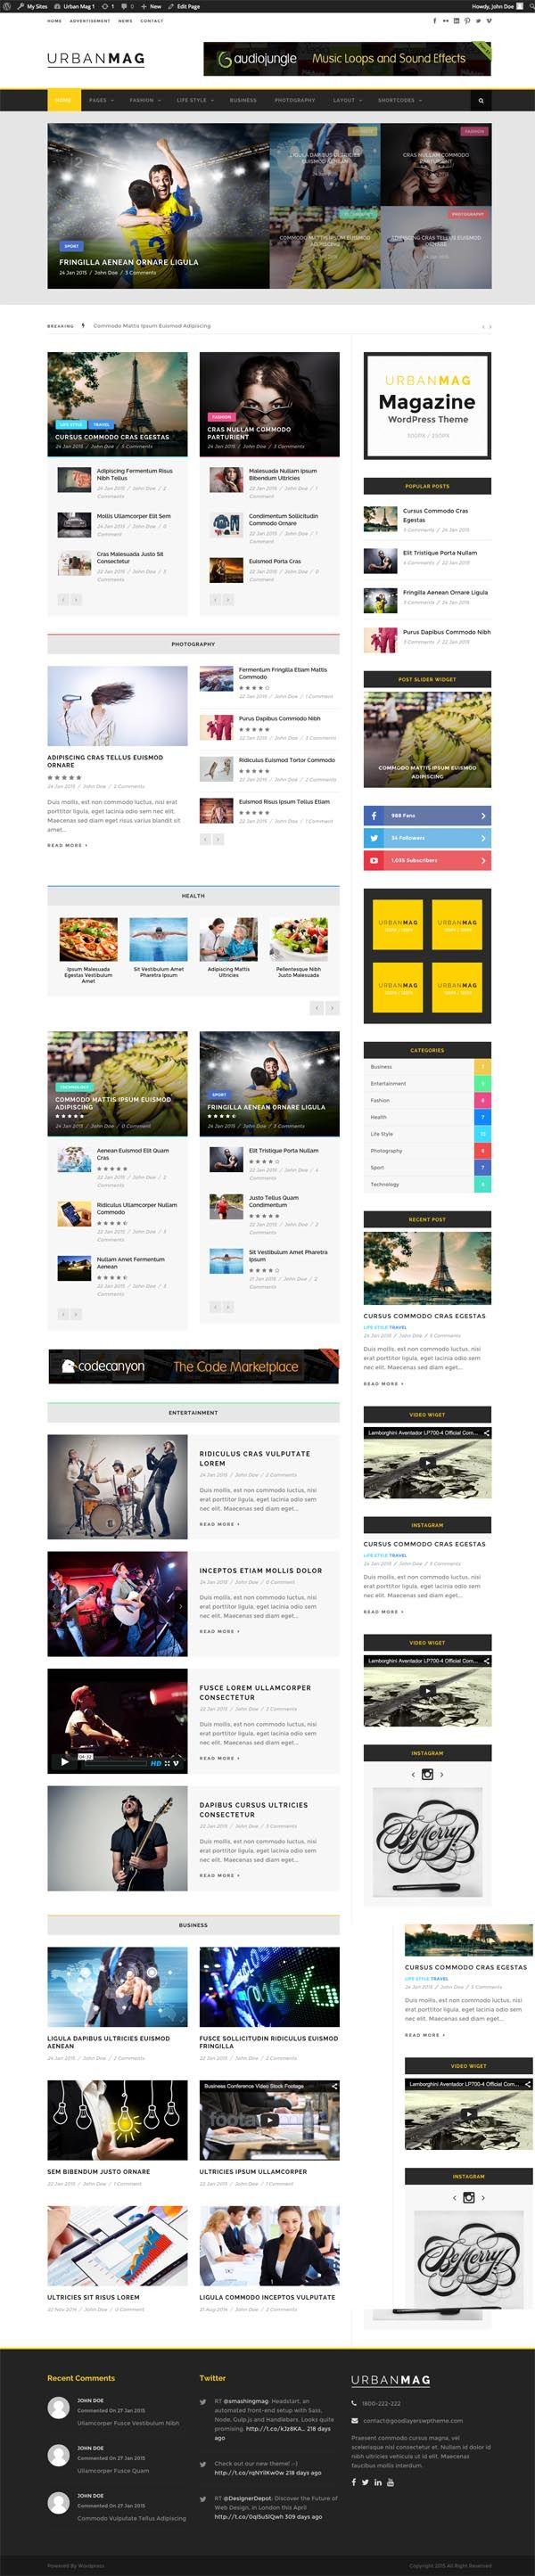 Urban Mag - News & Magazine WordPress Theme